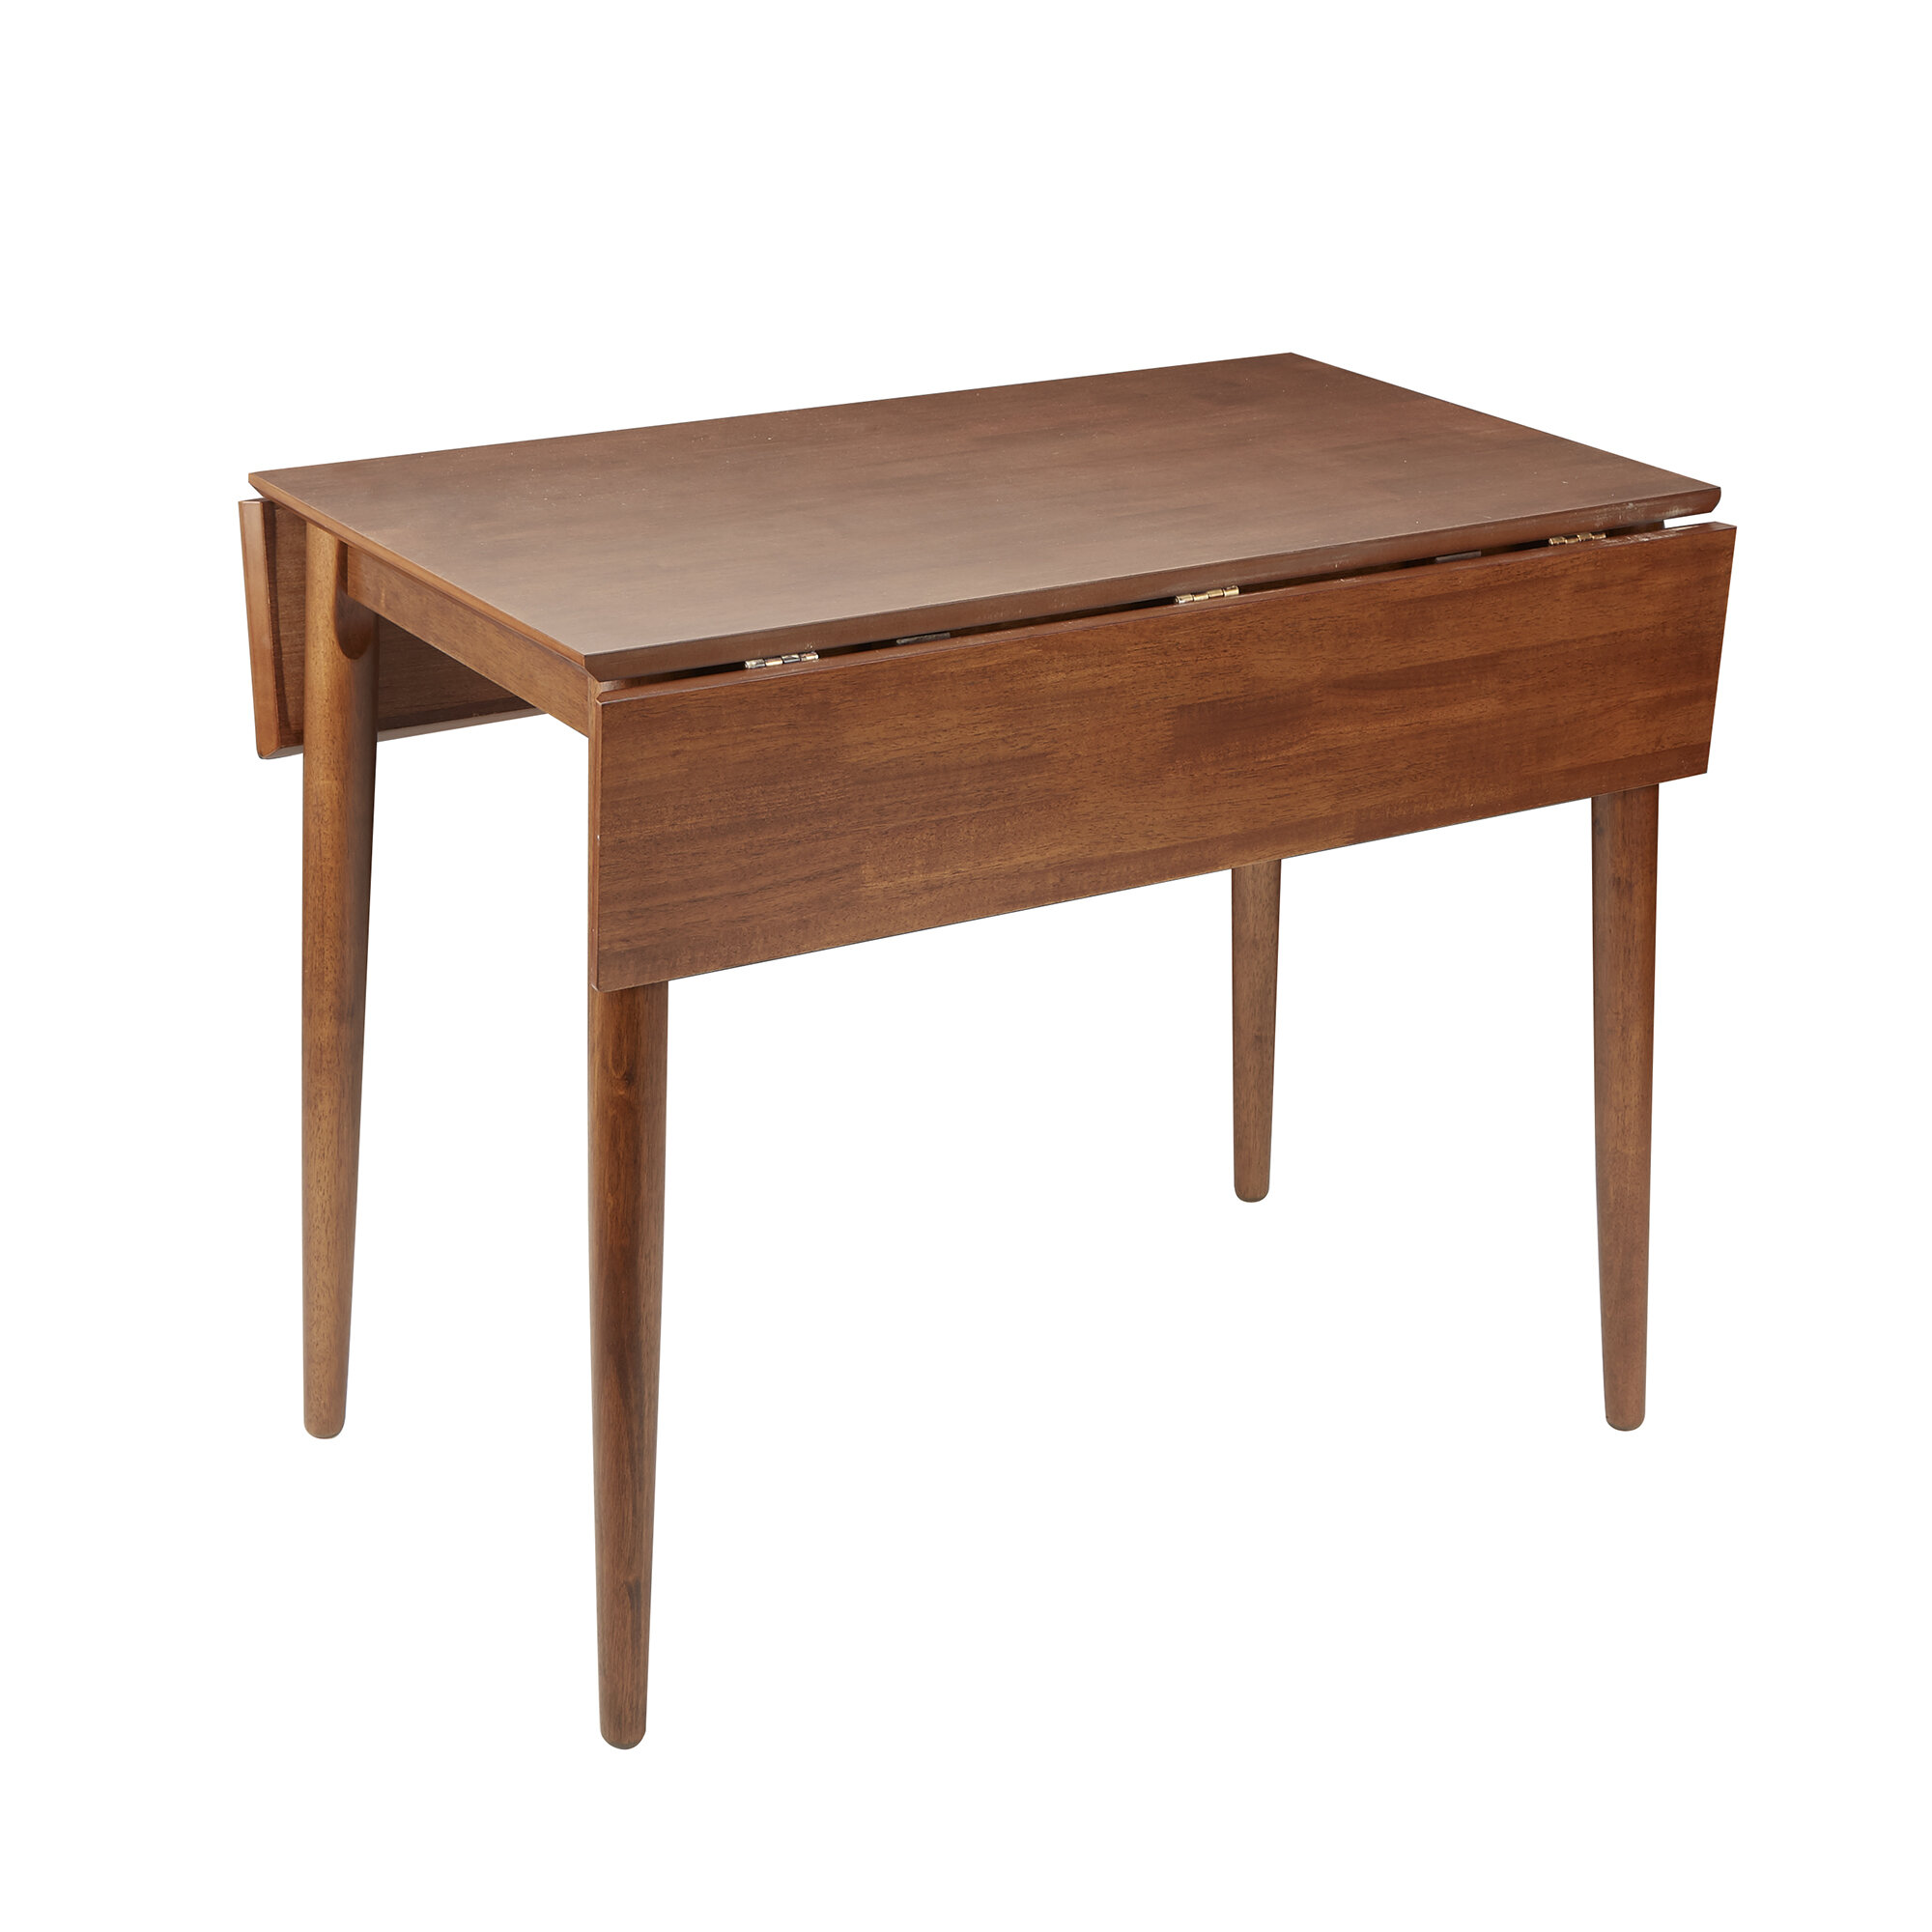 Ebern Designs Alidade Mid Century Modern Drop Leaf Dining Table